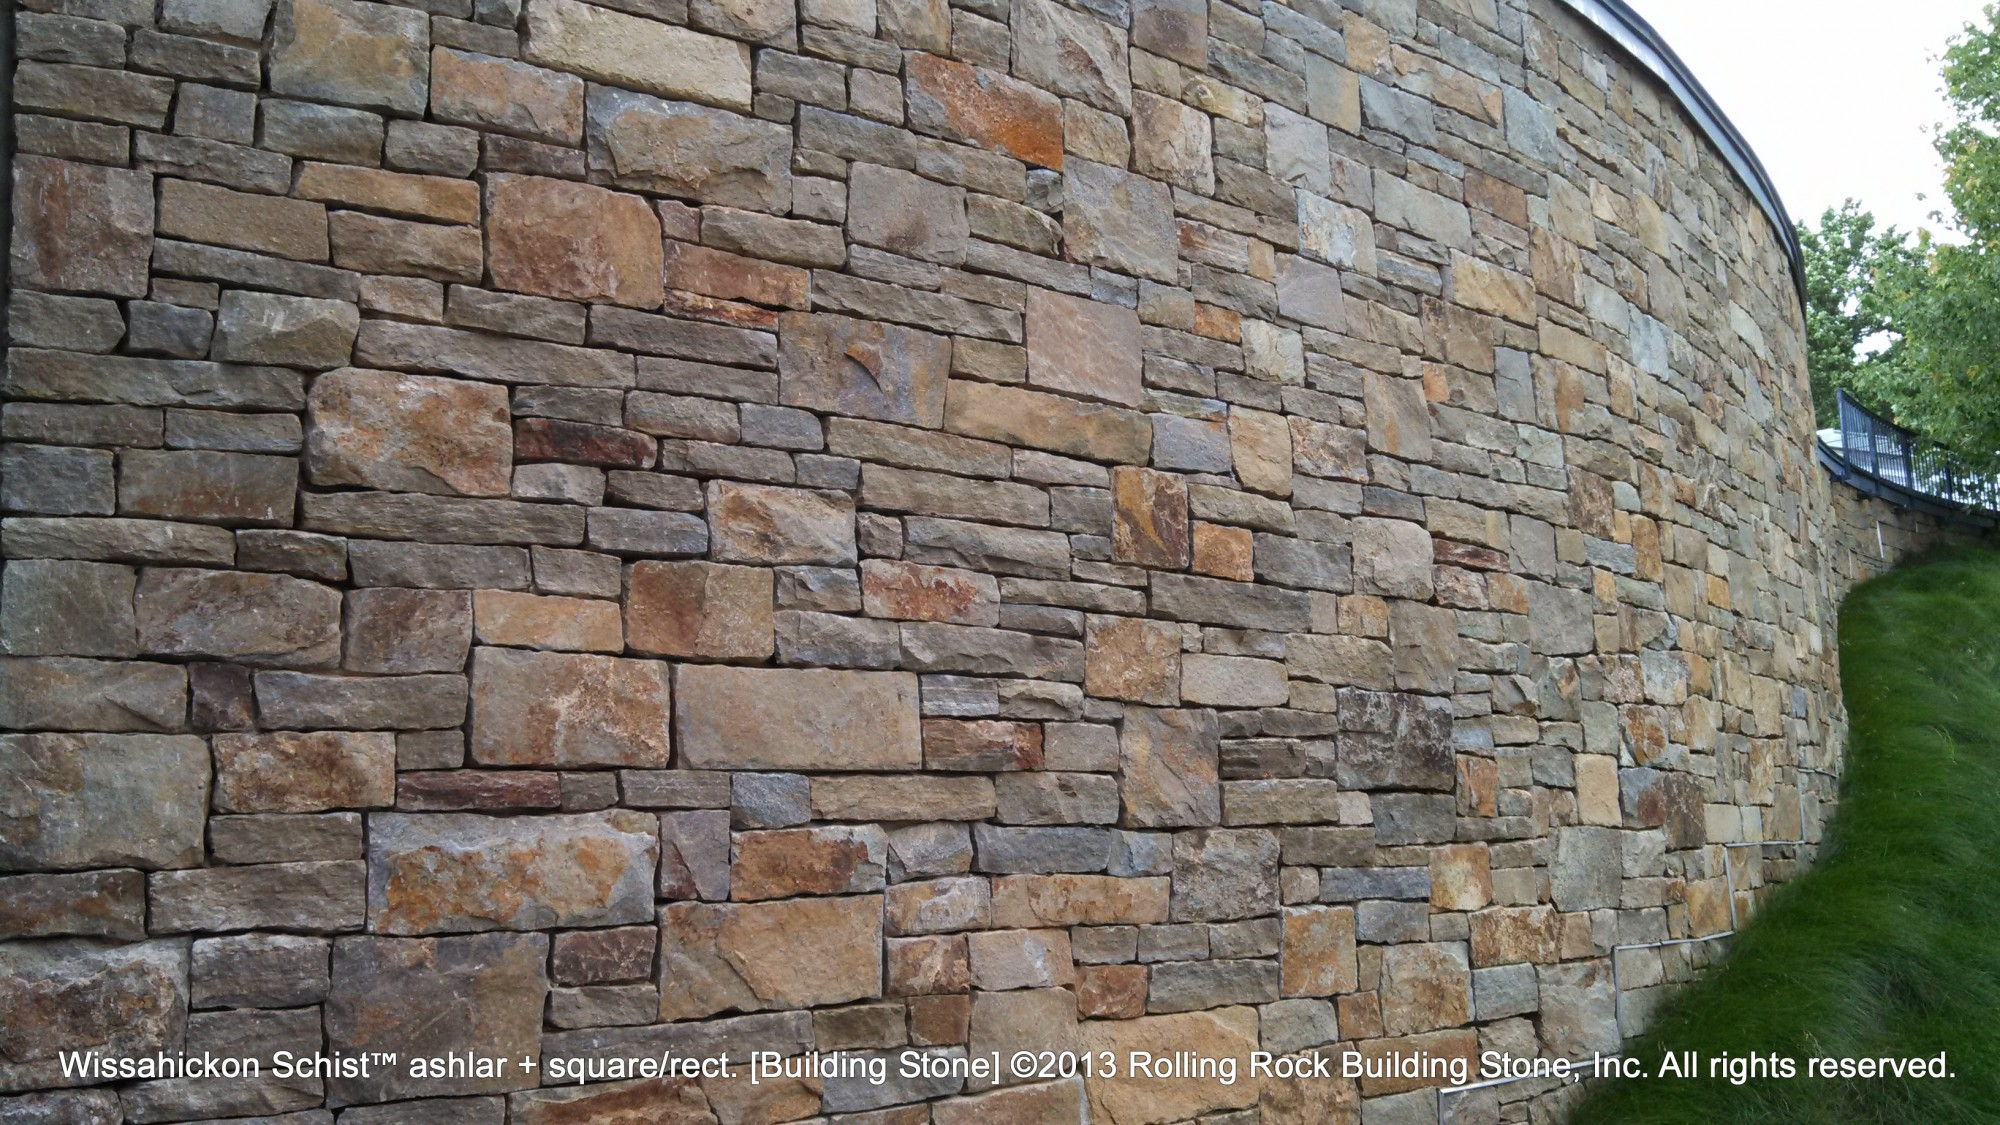 Natural Stone Construction : Wissahickon schist™ ashlar rolling rock building stone inc